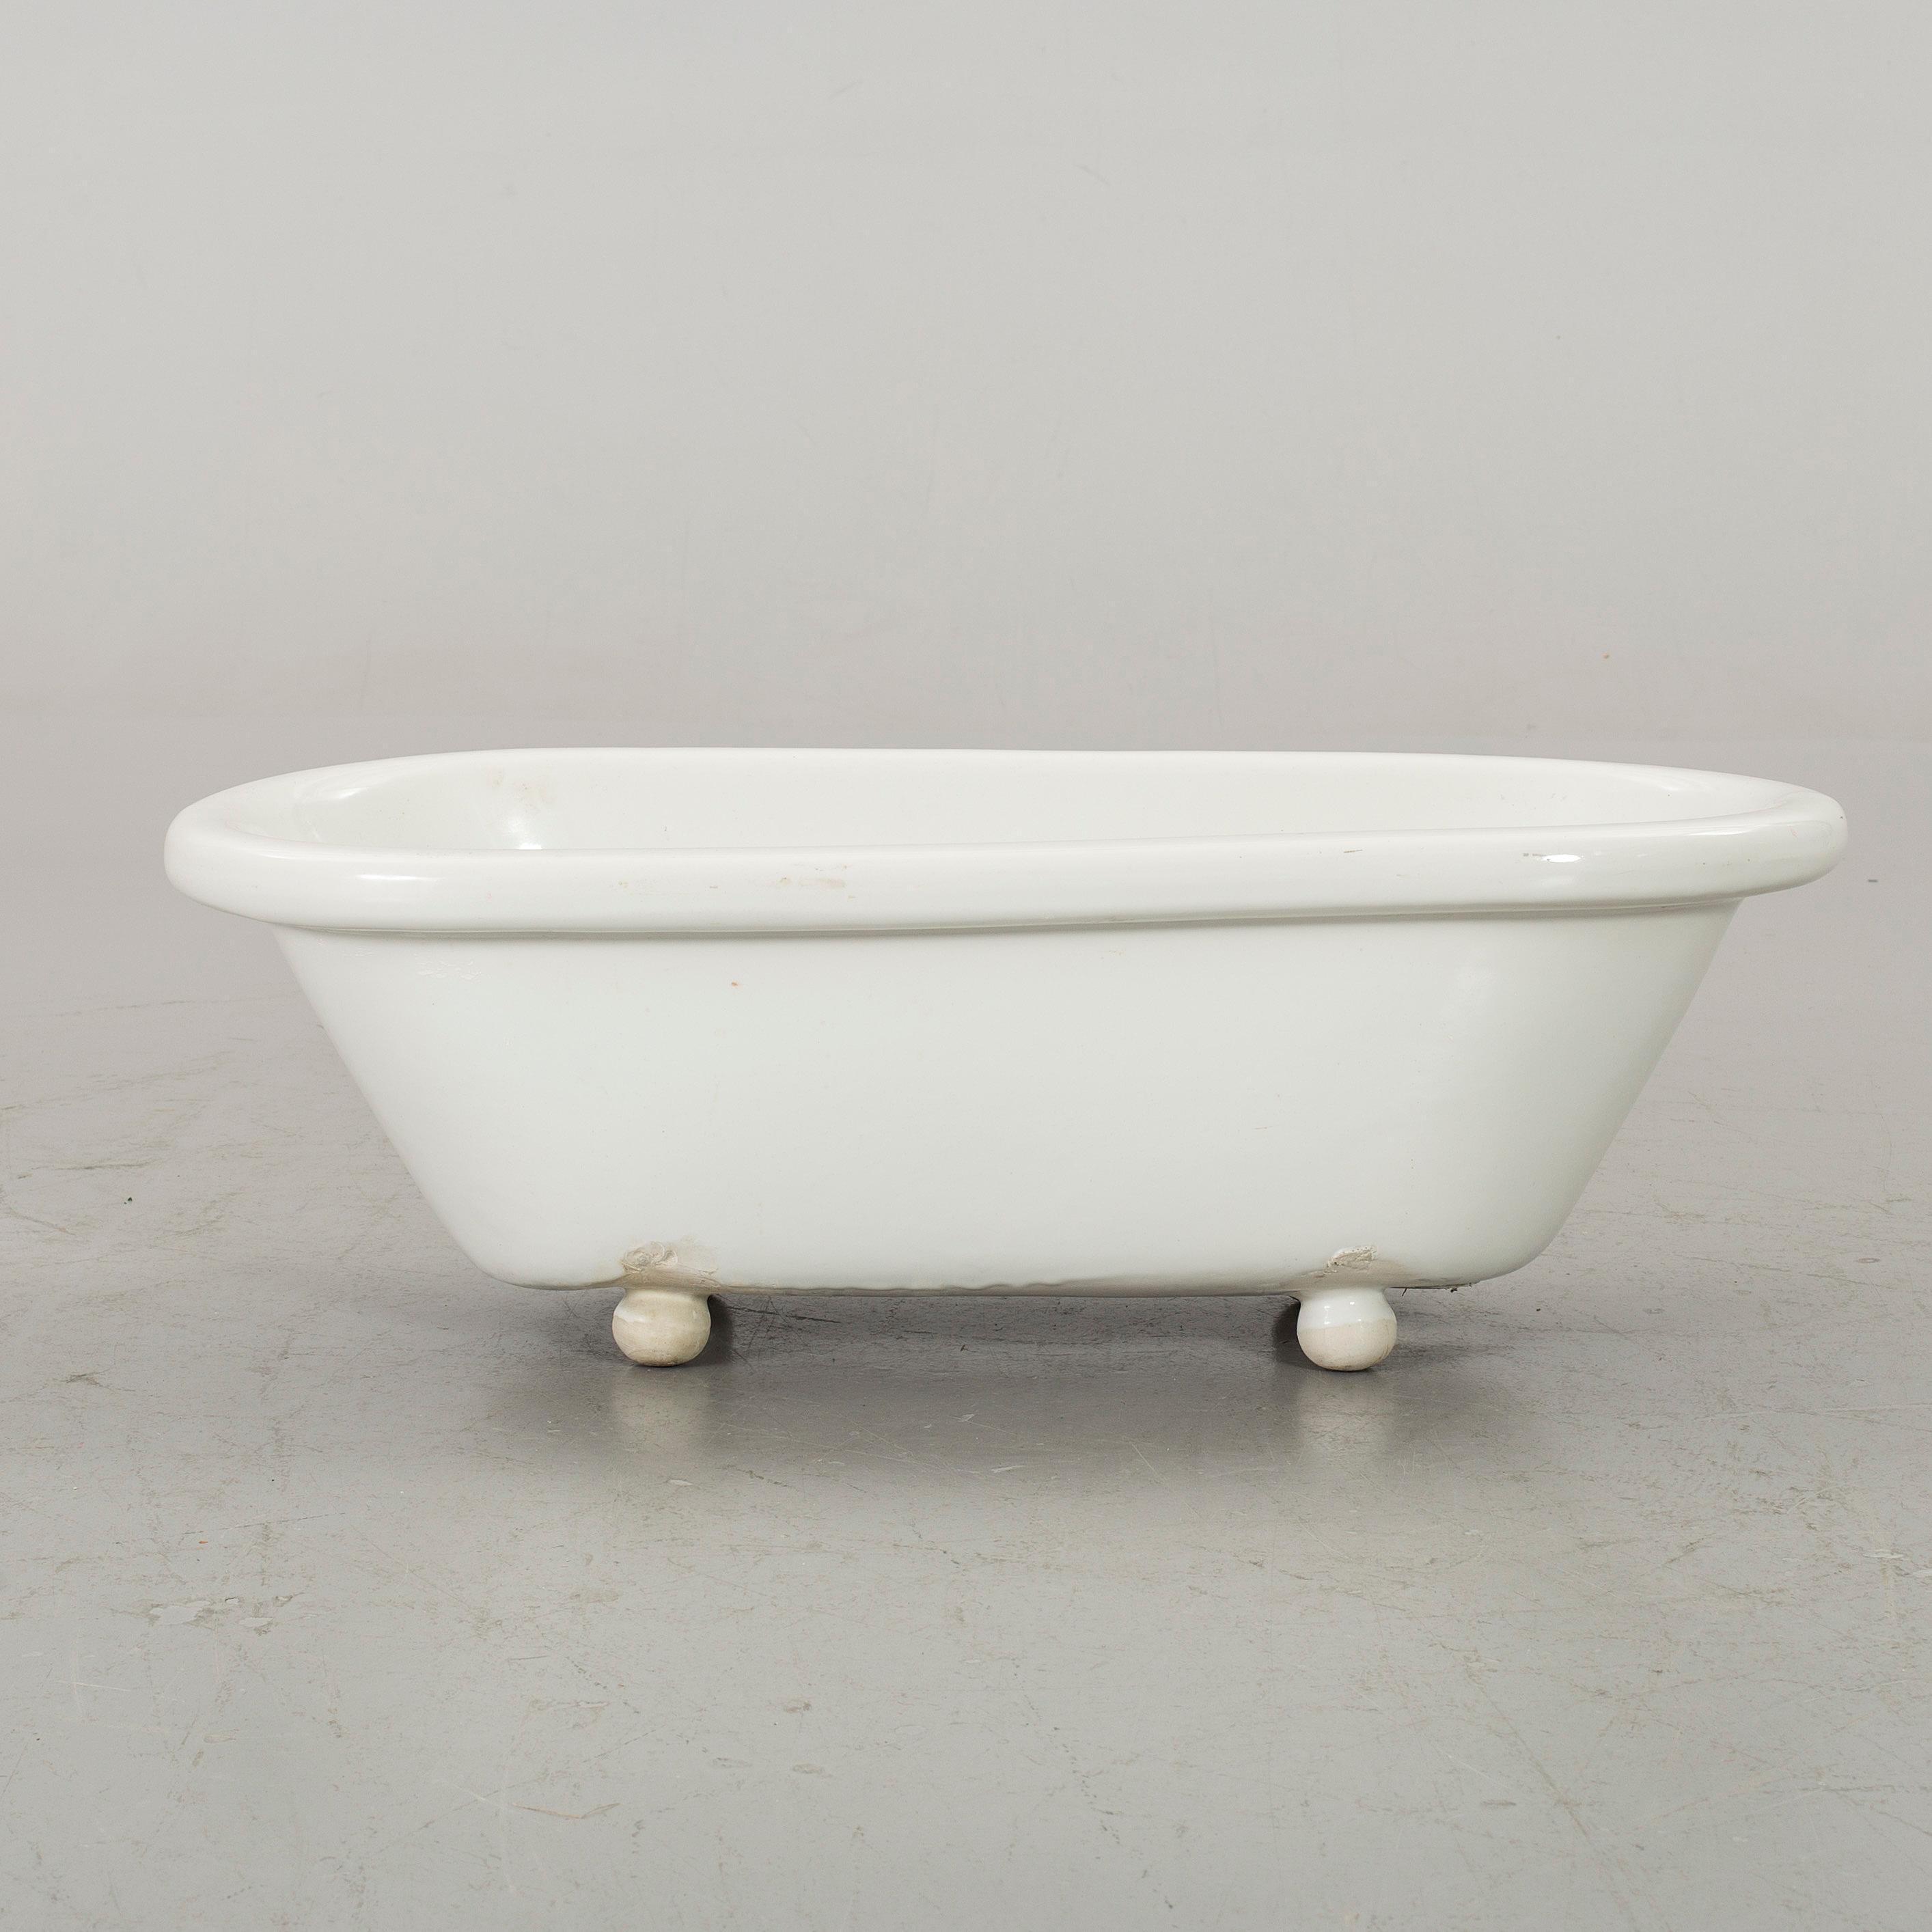 A PORCELAIN BATHTUB FOR CHILDREN. - Bukowskis